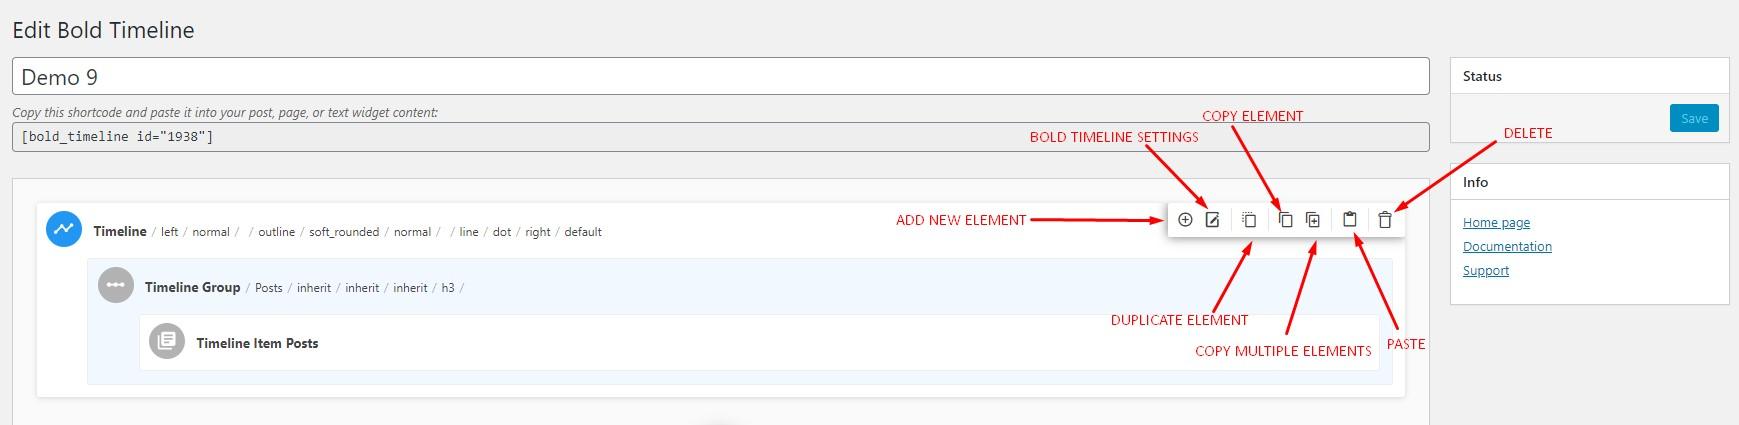 https://documentation.bold-themes.com/bold-timeline-lite/wp-content/uploads/sites/57/2019/11/elements.jpg